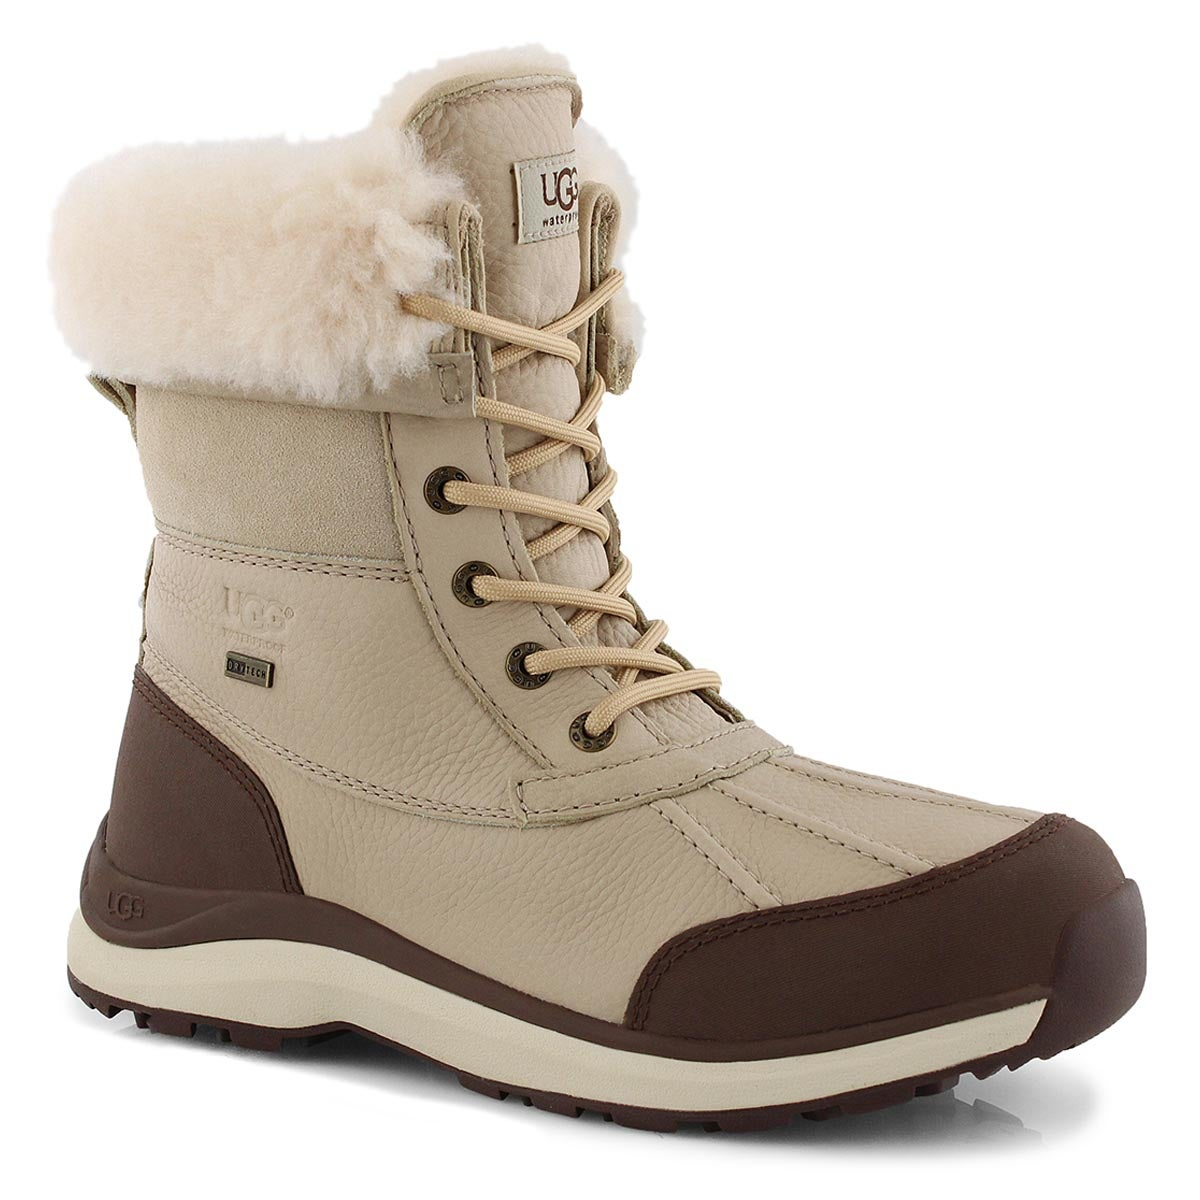 03dd4115e6a Women's ADIRONDACK III sand winter boots